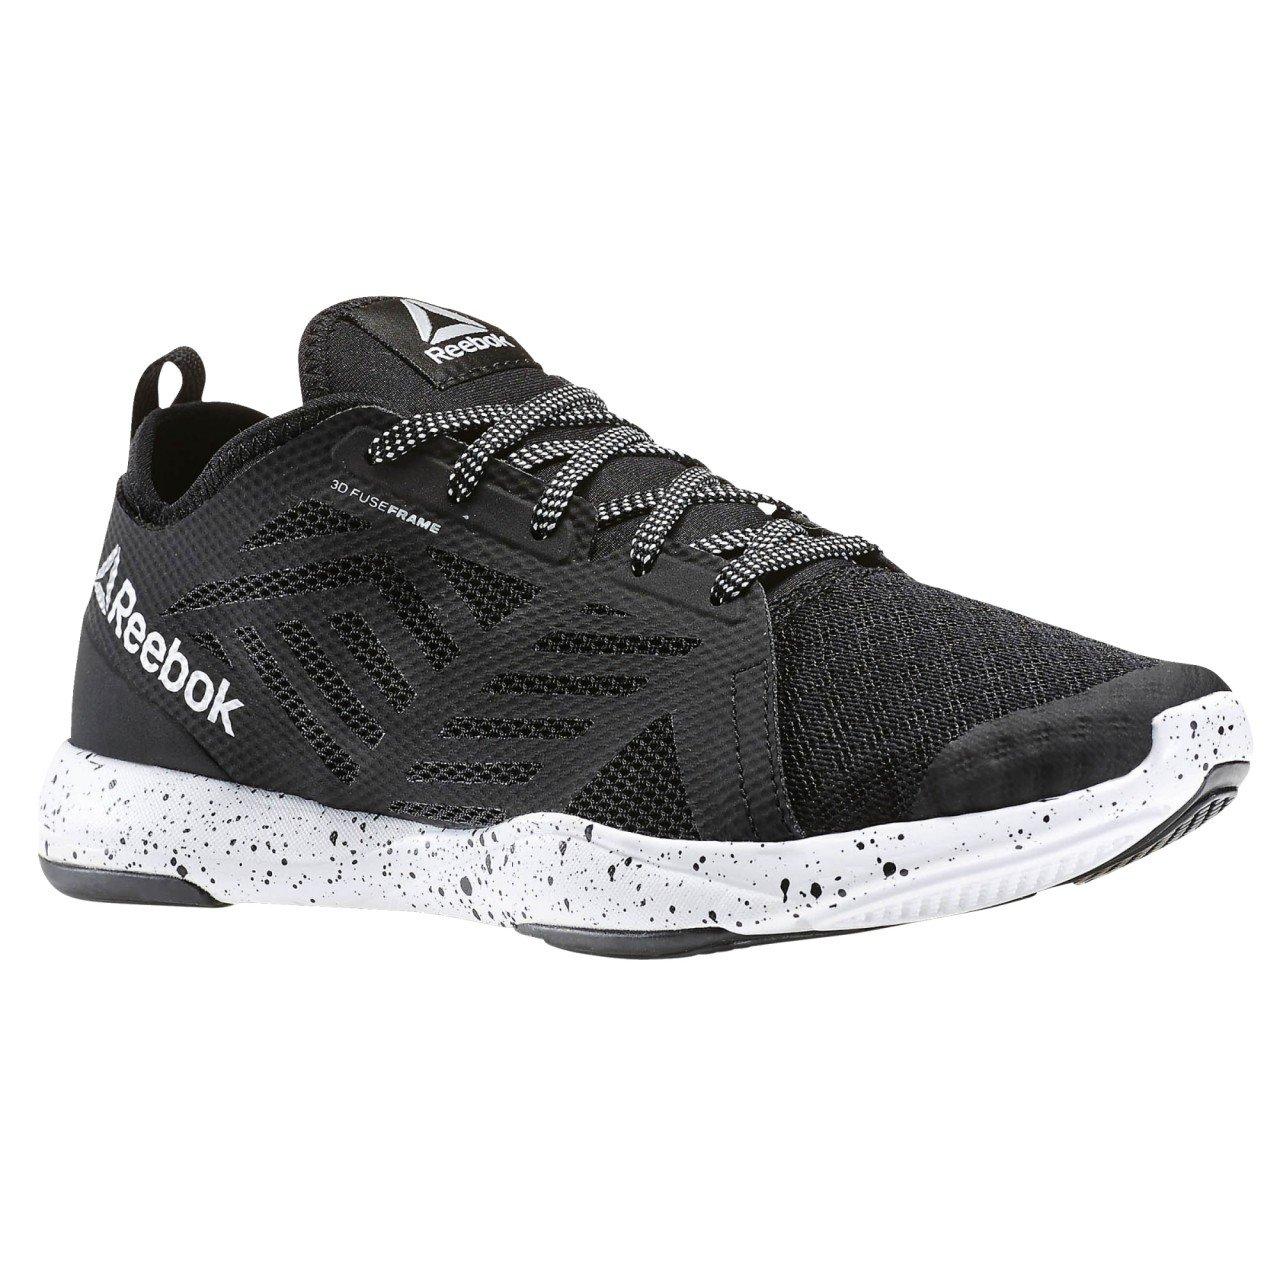 Reebok Cardio Inspire Low 2.0 Fitness-Schuhe Damen